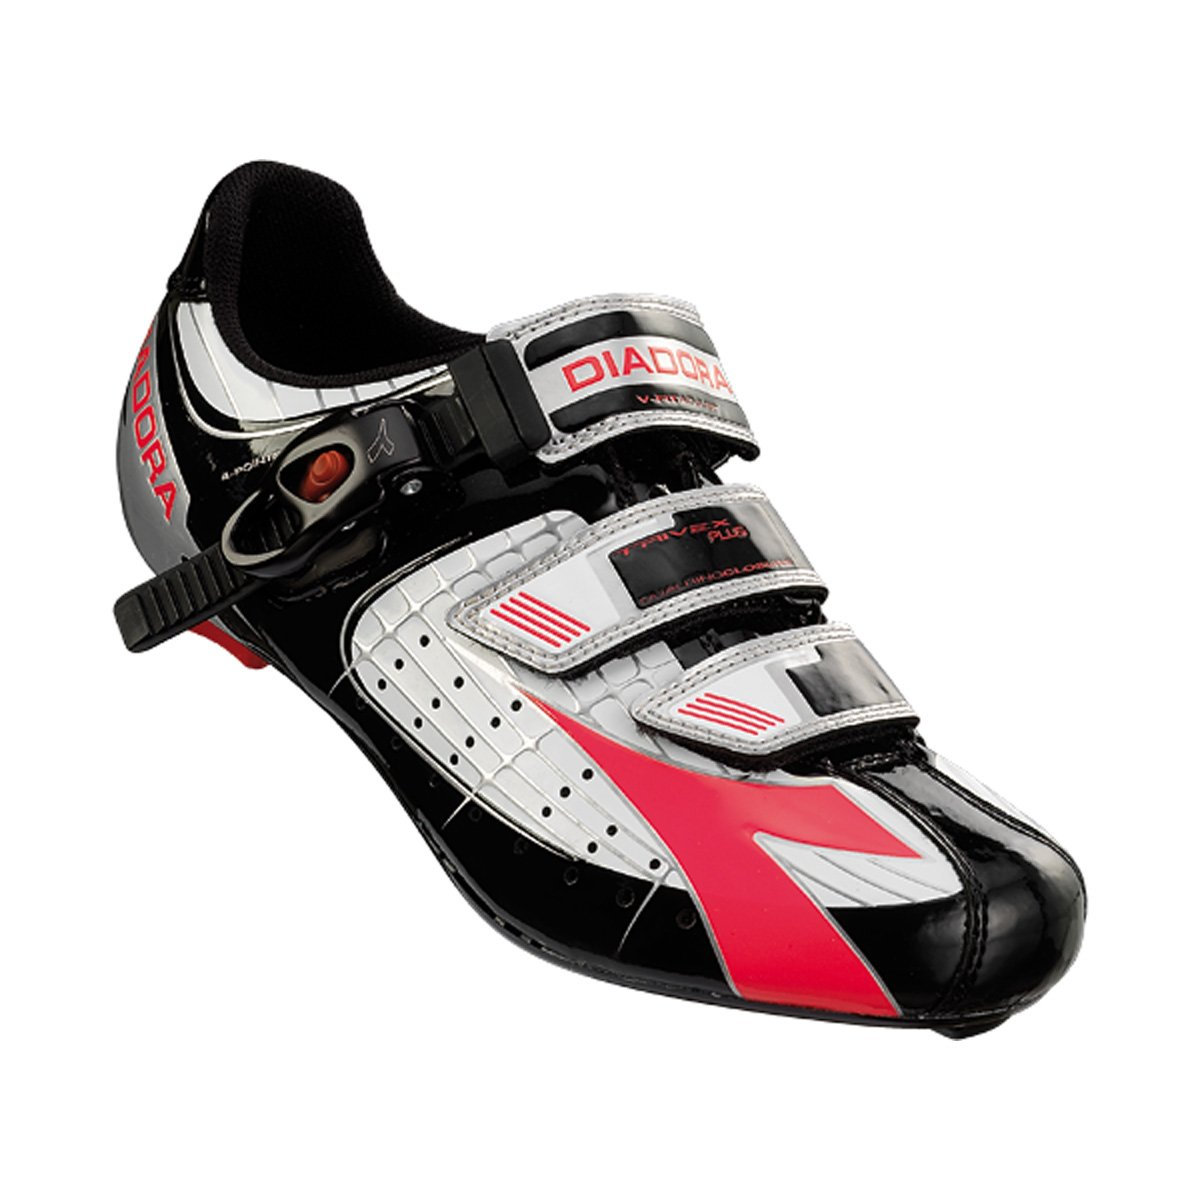 Diadora Women's Trivex Plus Road Cycling Shoe - 159741 (white/black/fuxia red - 39)